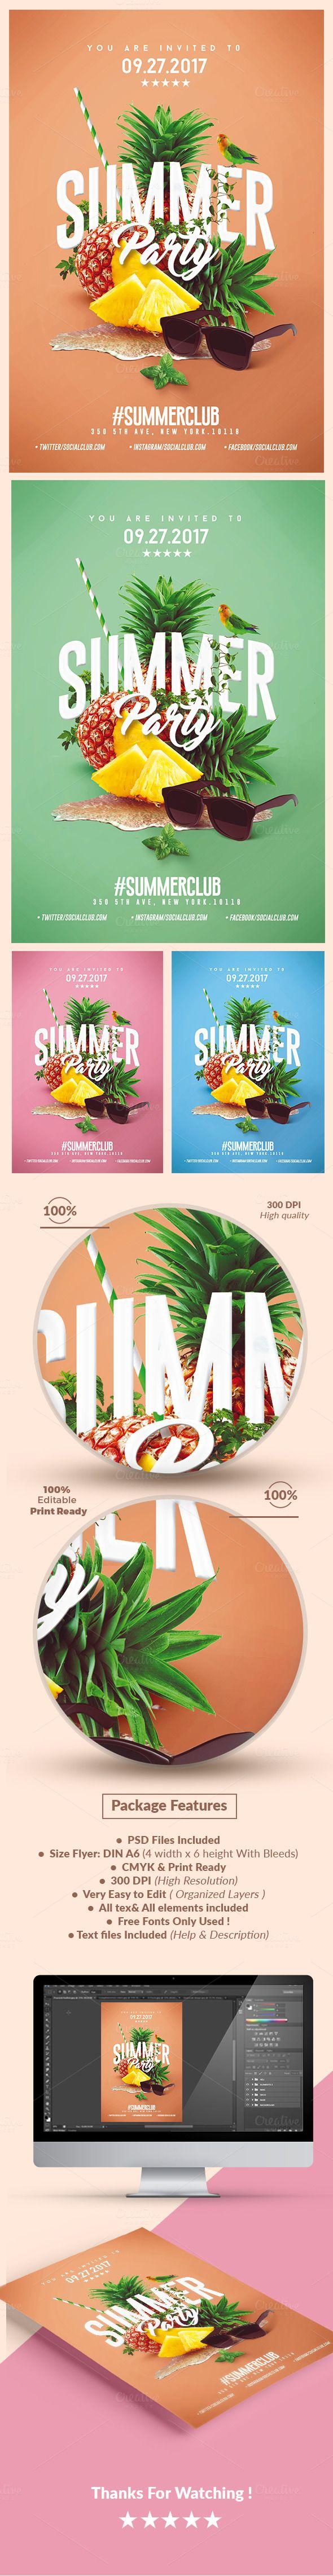 Summer Party | Psd Flyer Template 4 | Me gustas, Cartelitos y ...